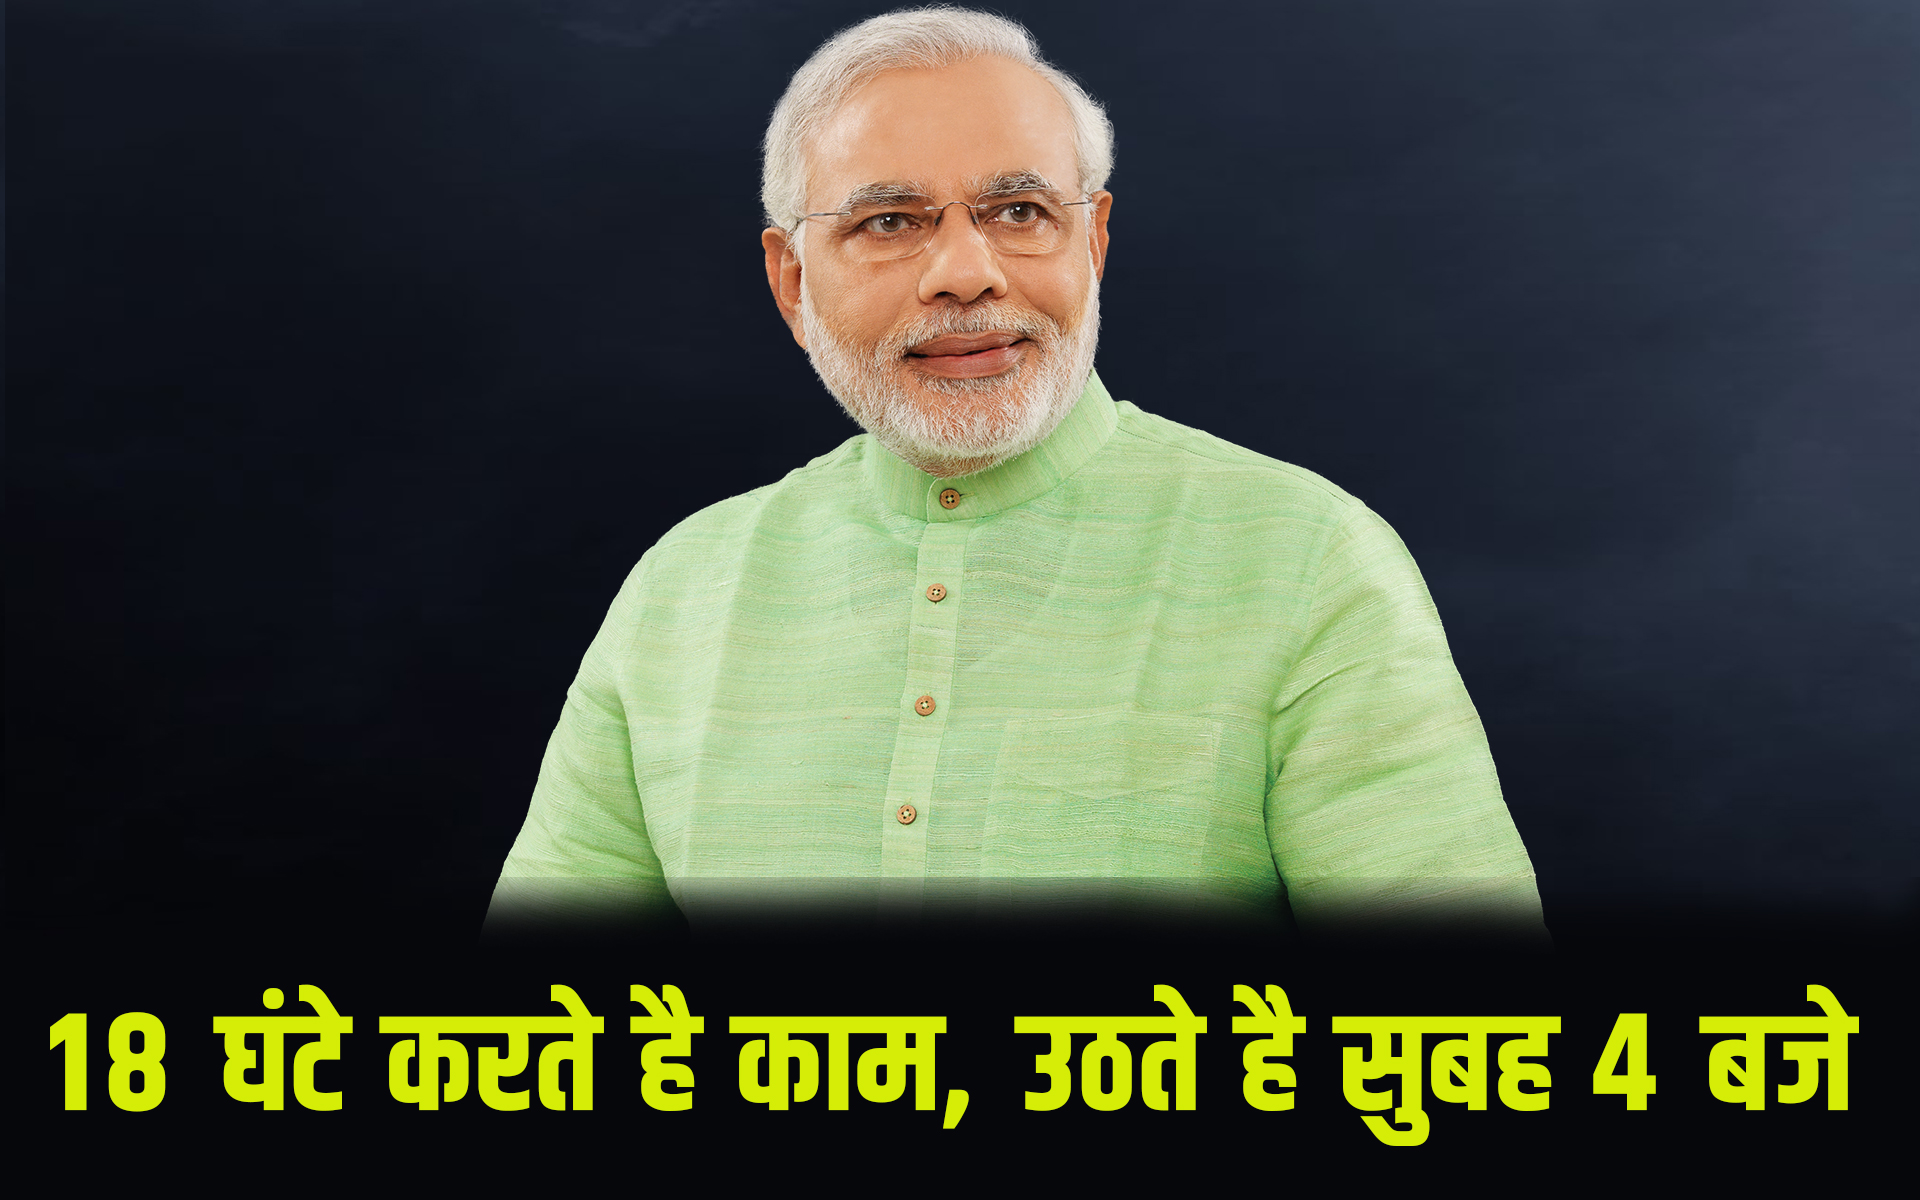 PM Narendra Modi, Fitness, Life Style, Energy, Indian Prime Minister, Exercise, Yoga, Catering, पीएम नरेन्द्र मोदी, फिटनेस, लाइफ स्टाइल, एनर्जी, भारतीय प्रधानमंत्री, व्यायाम, योग, खानपान, Narendra Modi, prime minister, PM, modi, Birthday, मोदी, नरेंद्र मोदी, प्रधानमंत्री, पीएम, जन्मदिन,narendra modi lifesyle yoga,PM Narendra Modi Daily Routine,narendra modi,daily routine,yoga,daily work,prime minister narendra modi, narendra modi wallpaper, narendra modi daily routine, modi daily routine,